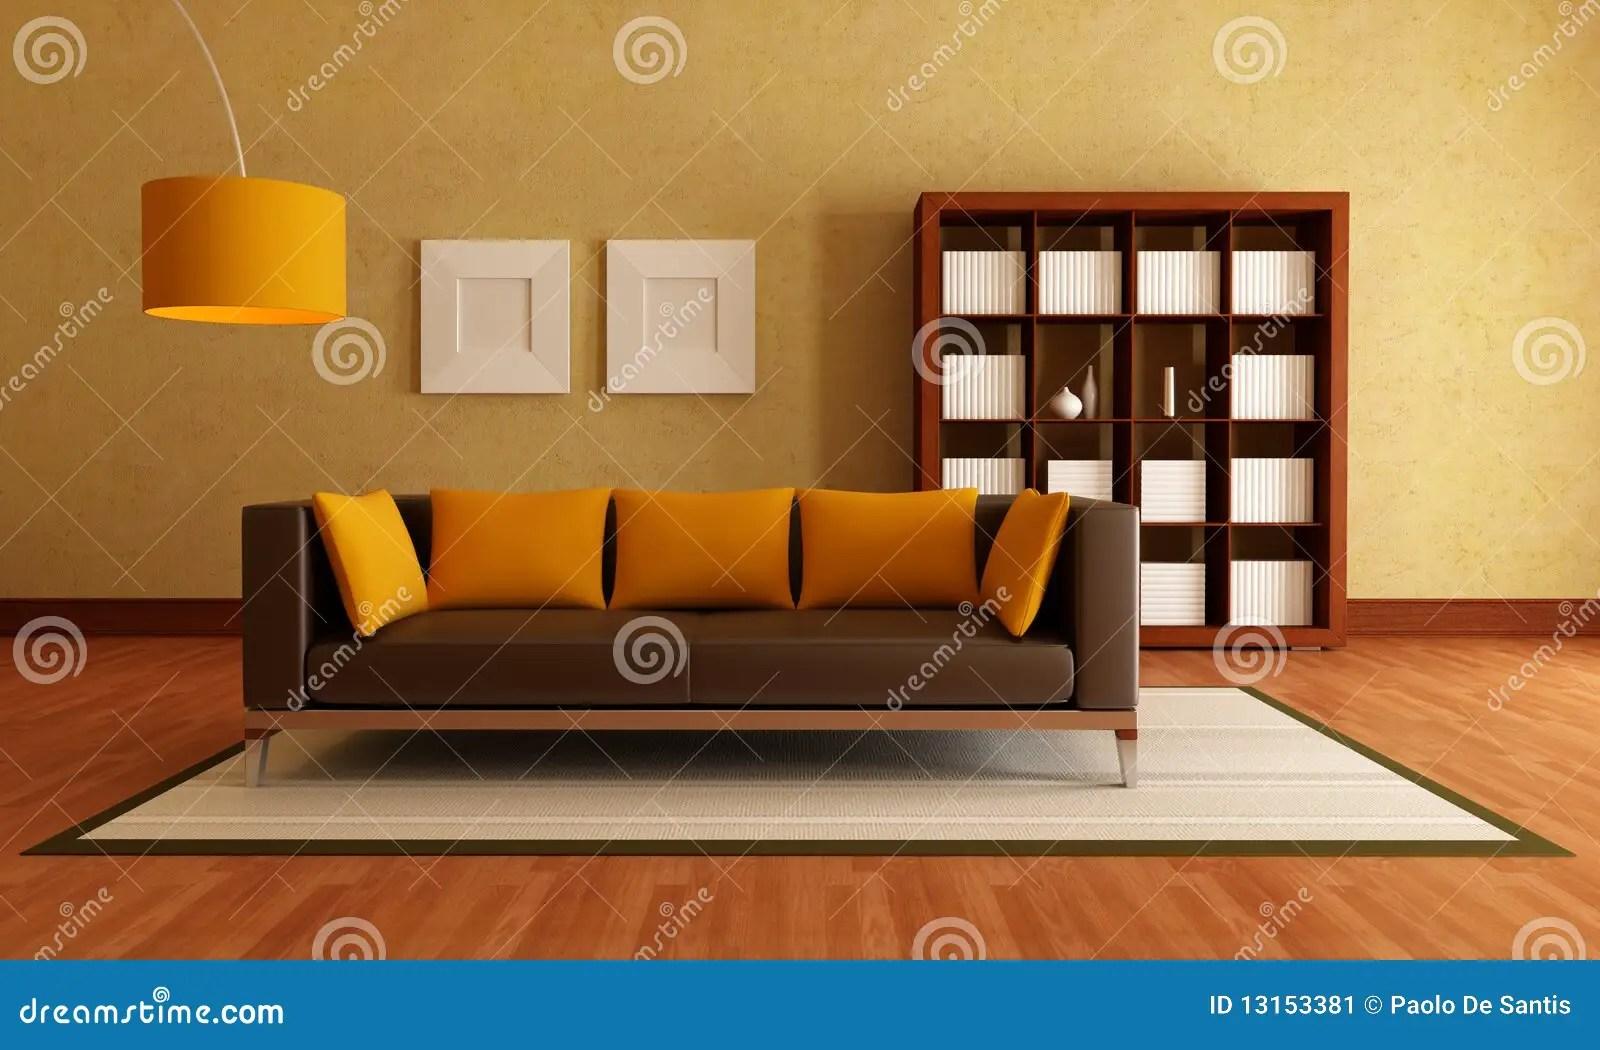 brown and orange living room black high gloss furniture uk stock illustration of